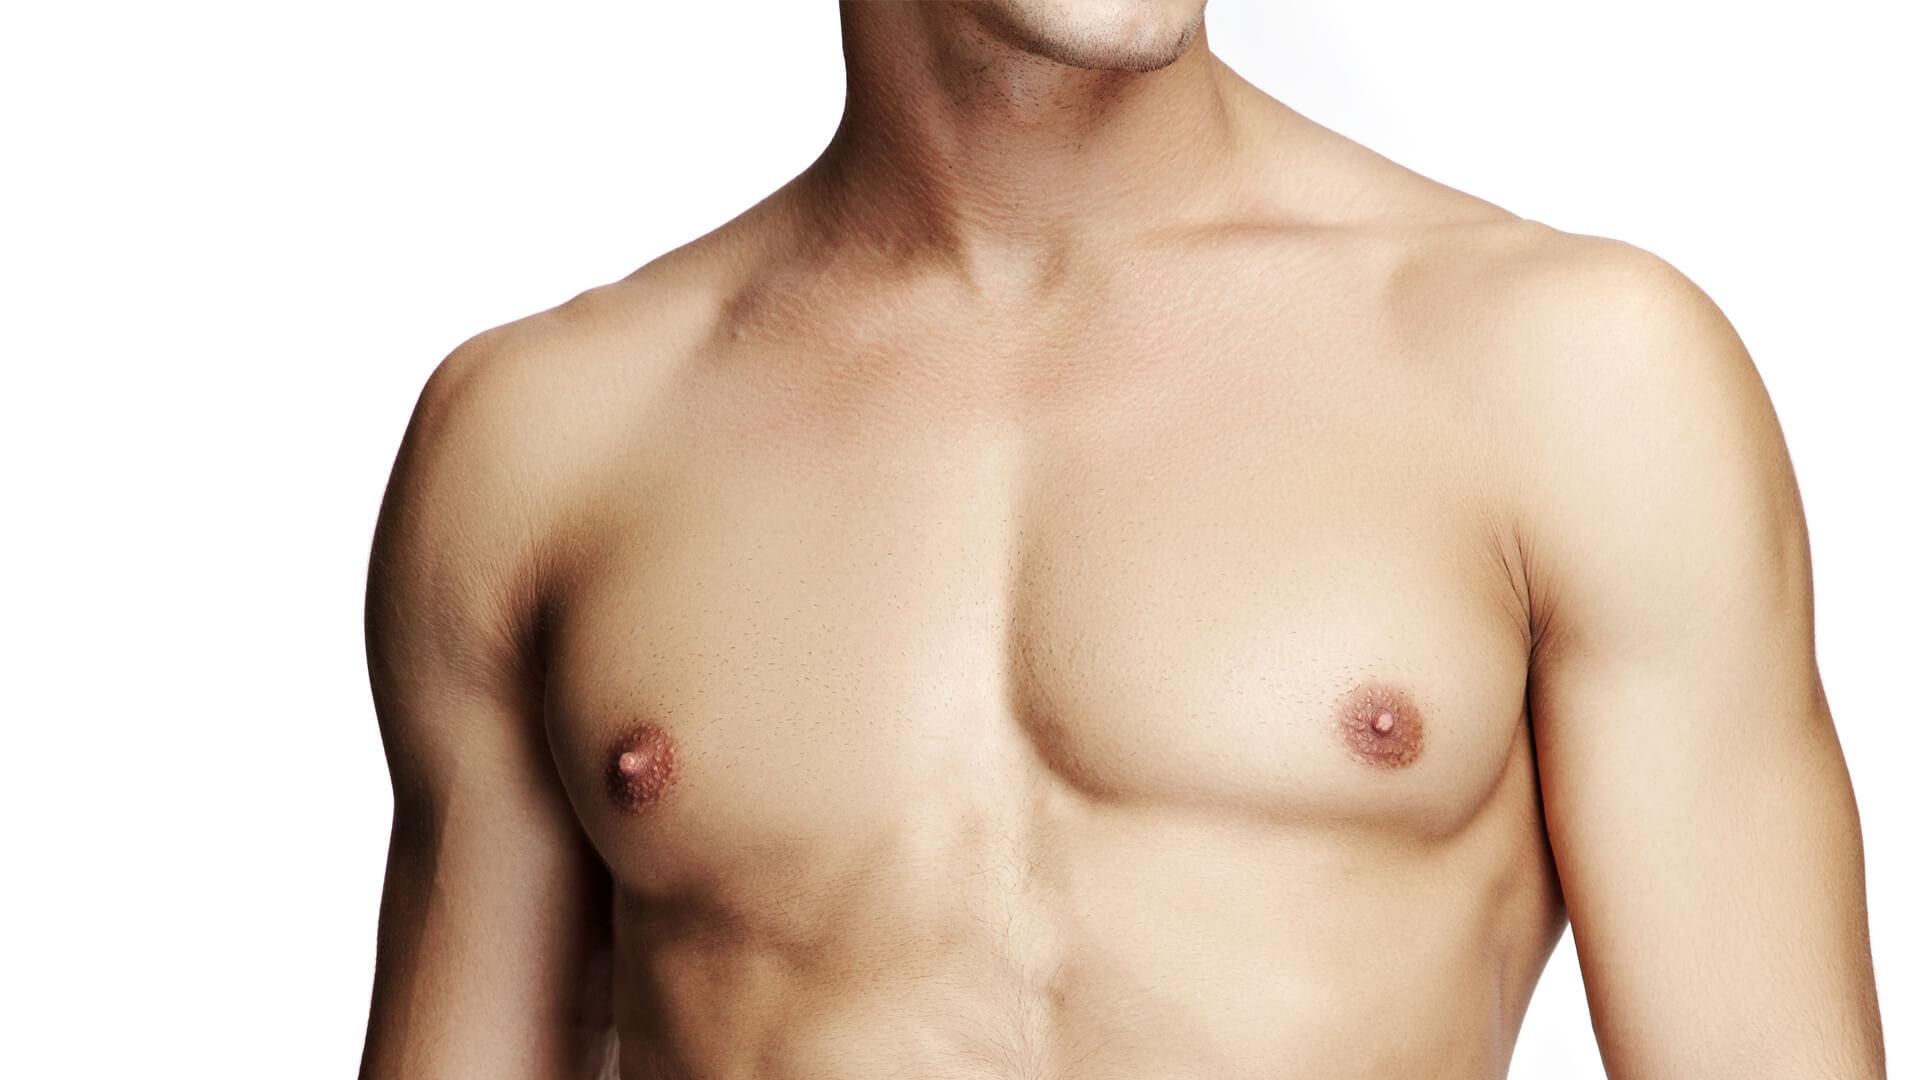 man_body image